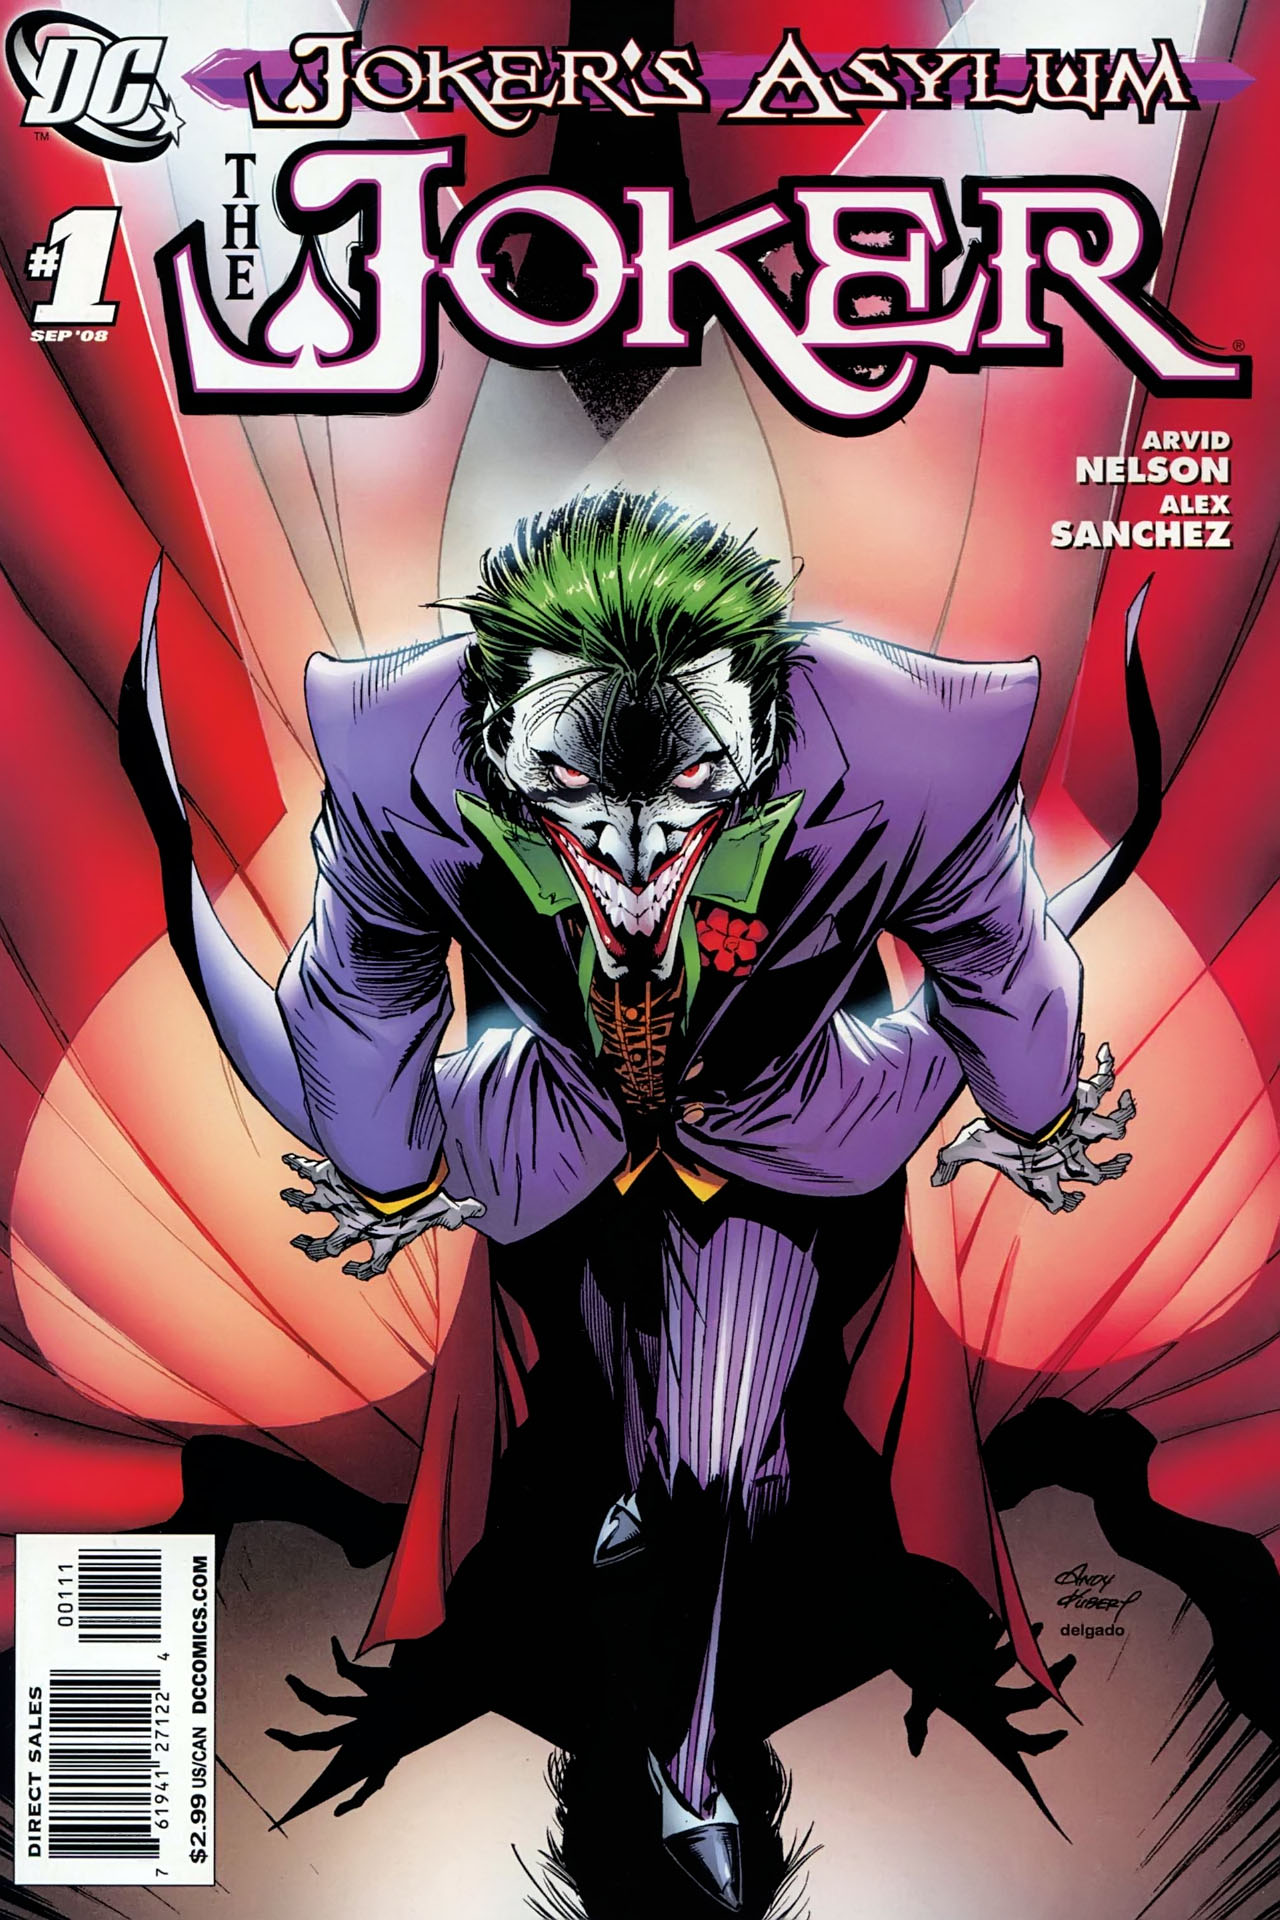 Joker's Asylum: The Joker Vol.1 #1